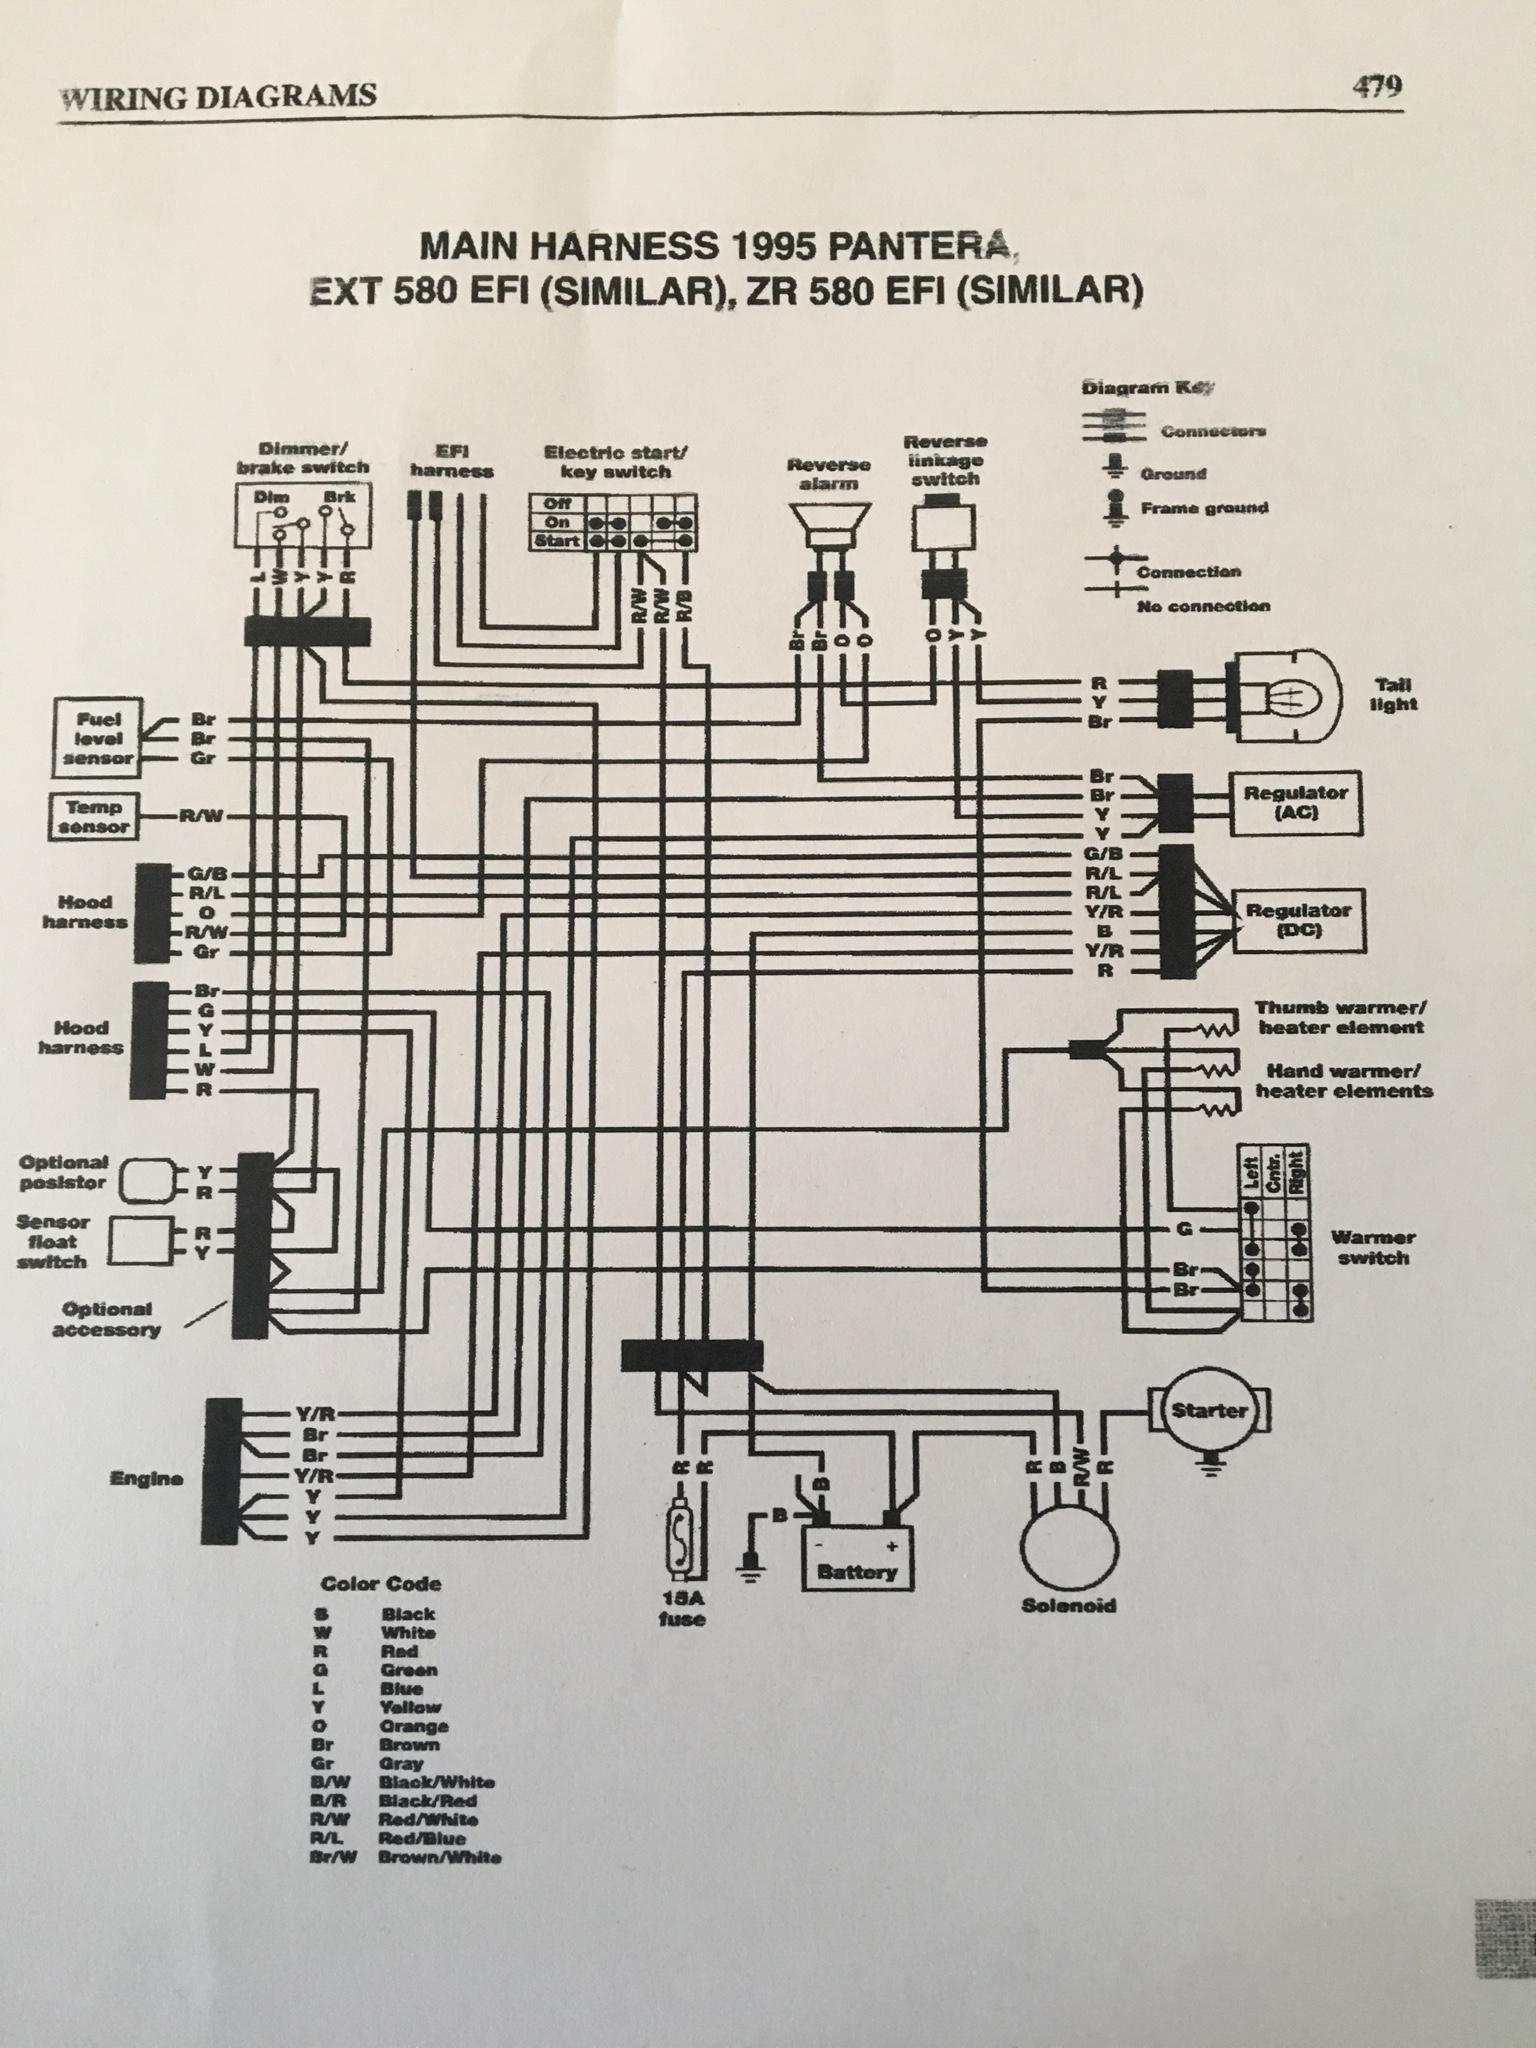 Bass Cat Pantera 2 Wiring Diagram